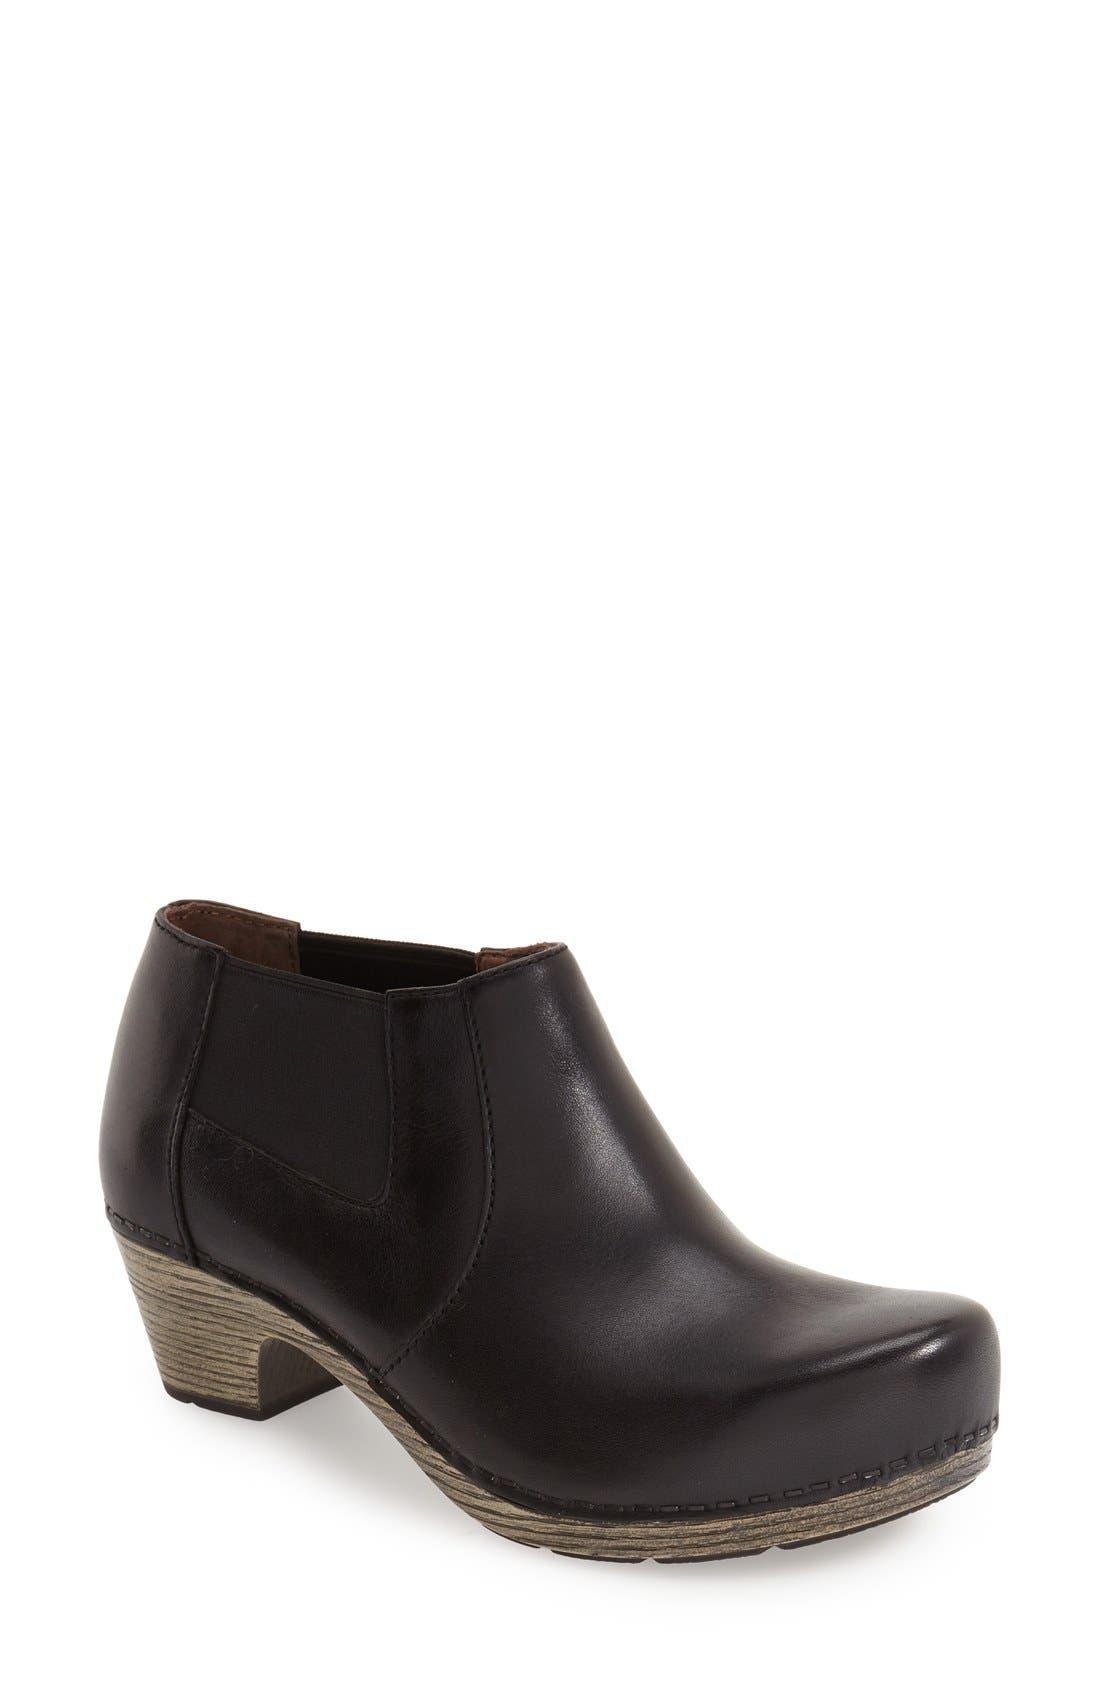 Alternate Image 1 Selected - Dansko 'Marilyn' Midi Chelsea Boot (Women)